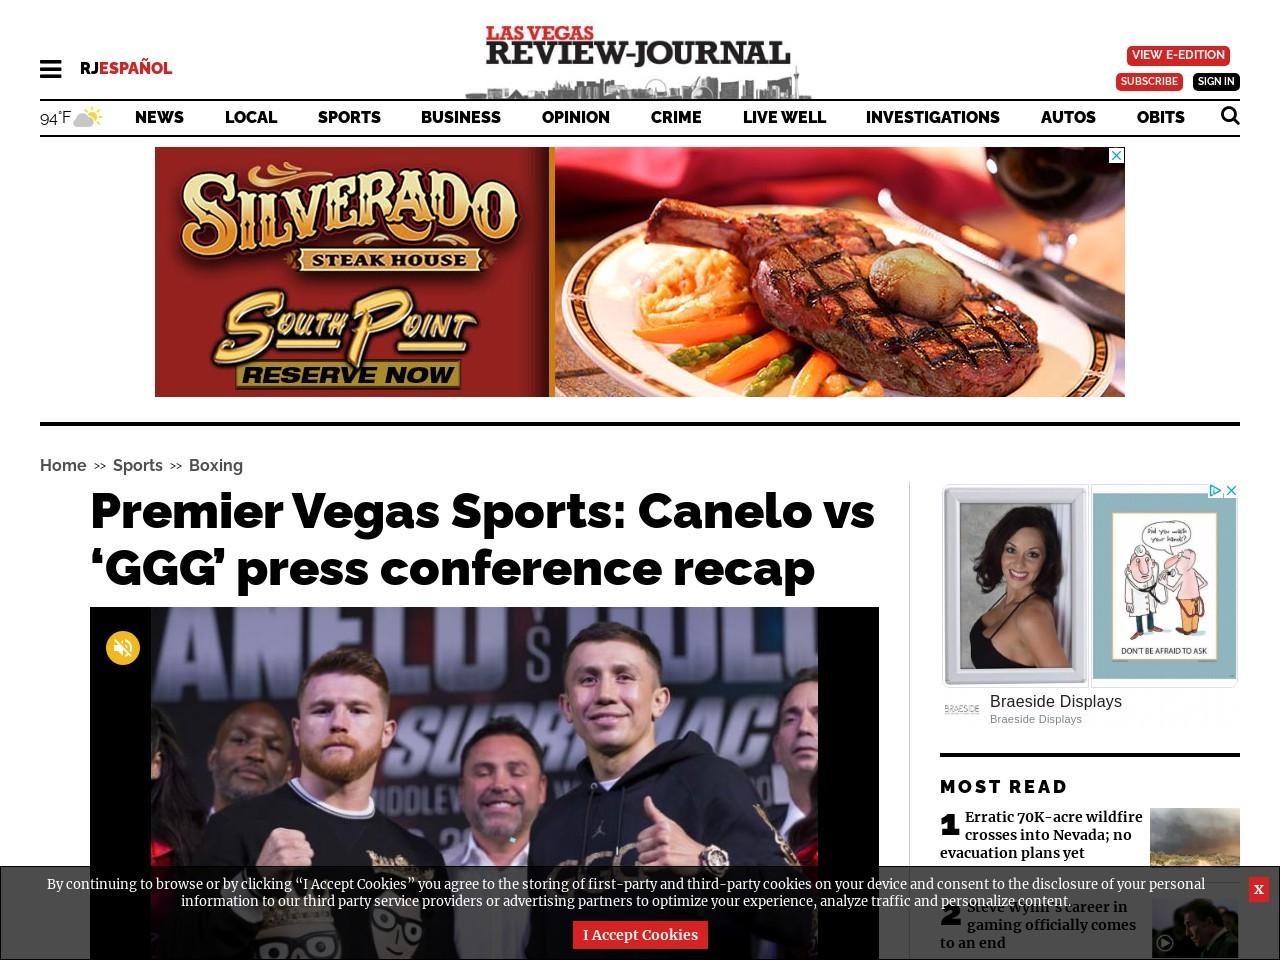 Premier Vegas Sports: Canelo vs 'GGG' press conference recap